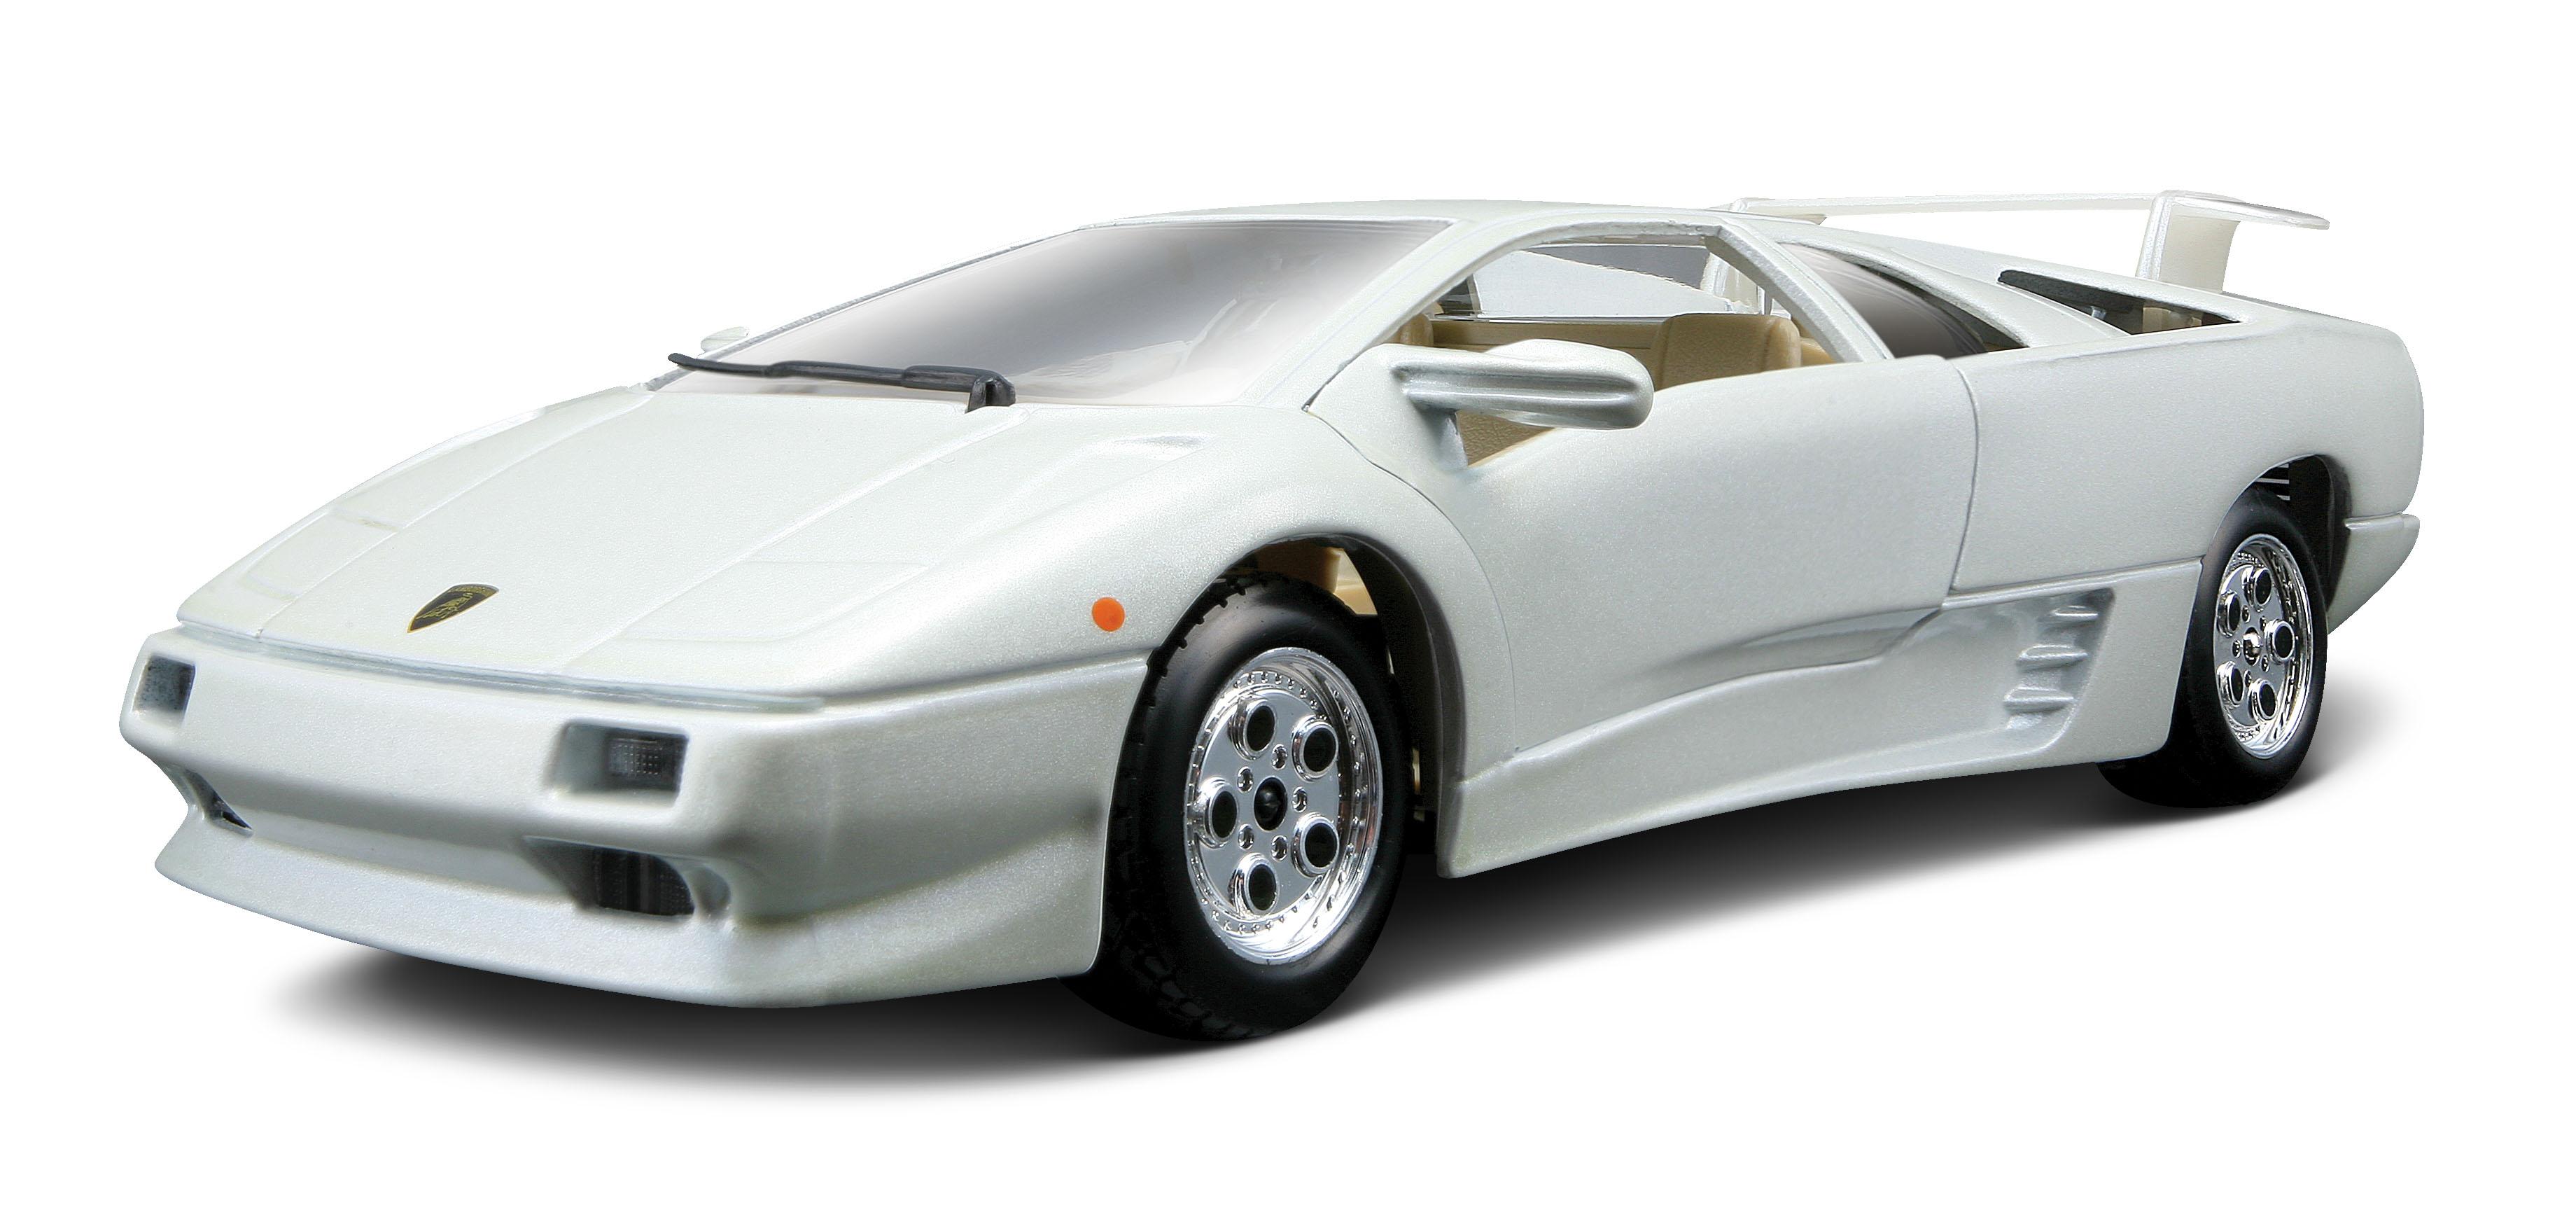 Hattons Co Uk Burago 18 22086wh Lamborghini Diablo White